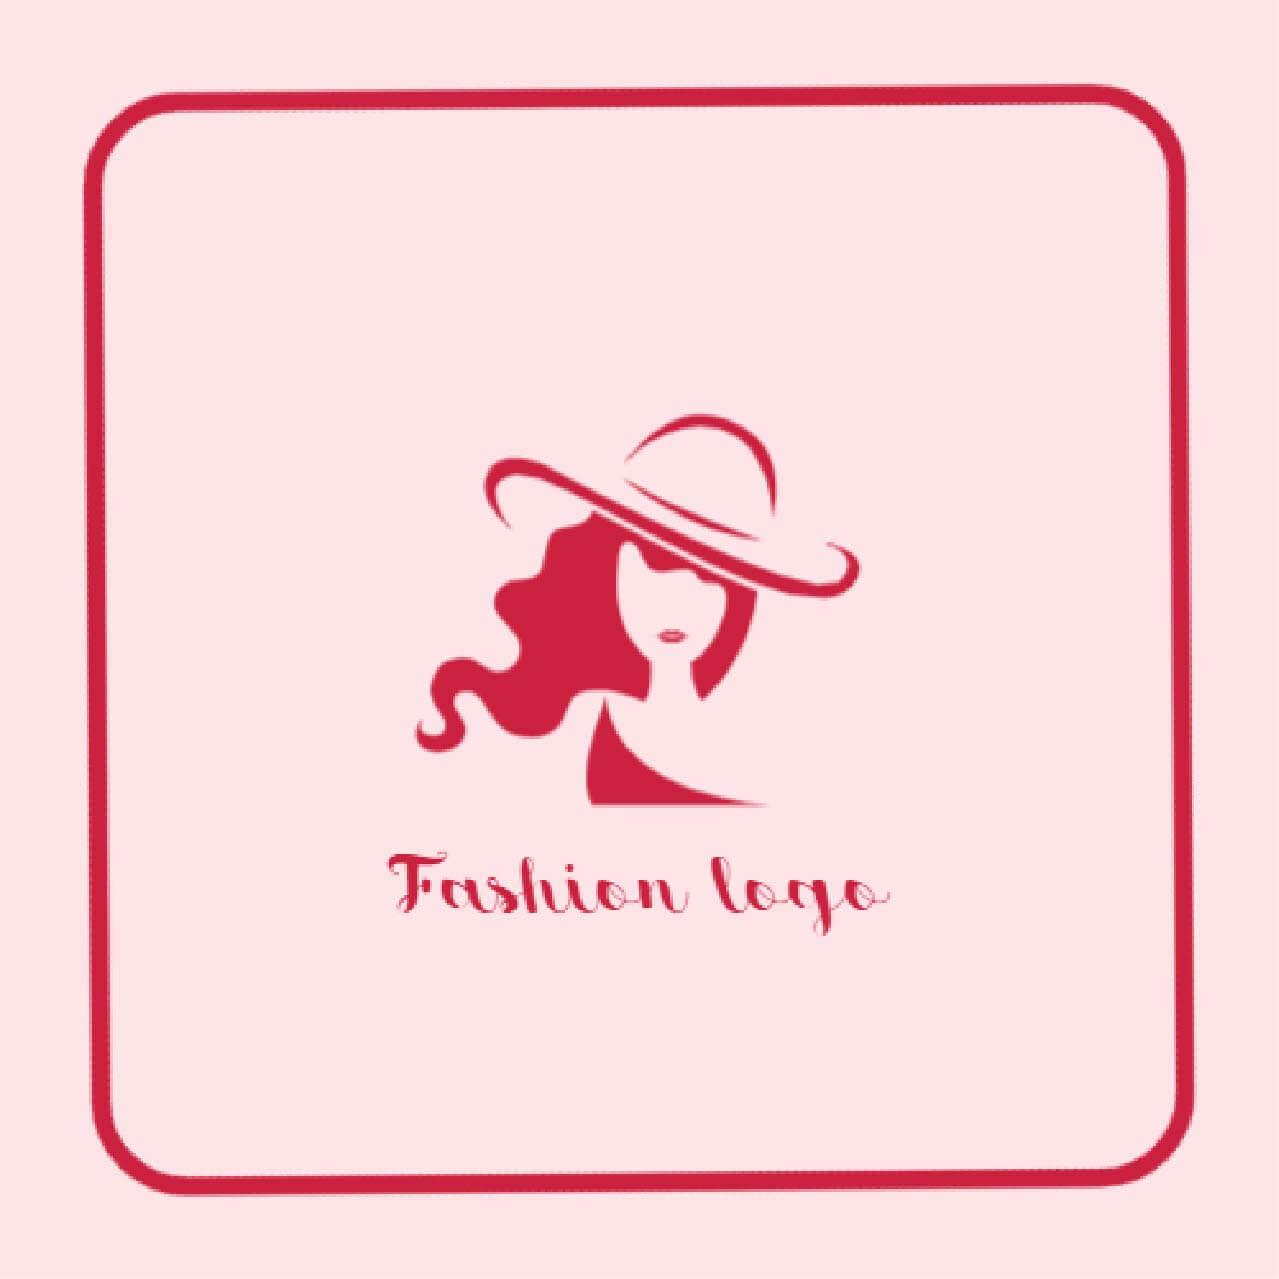 Fashion logo maker